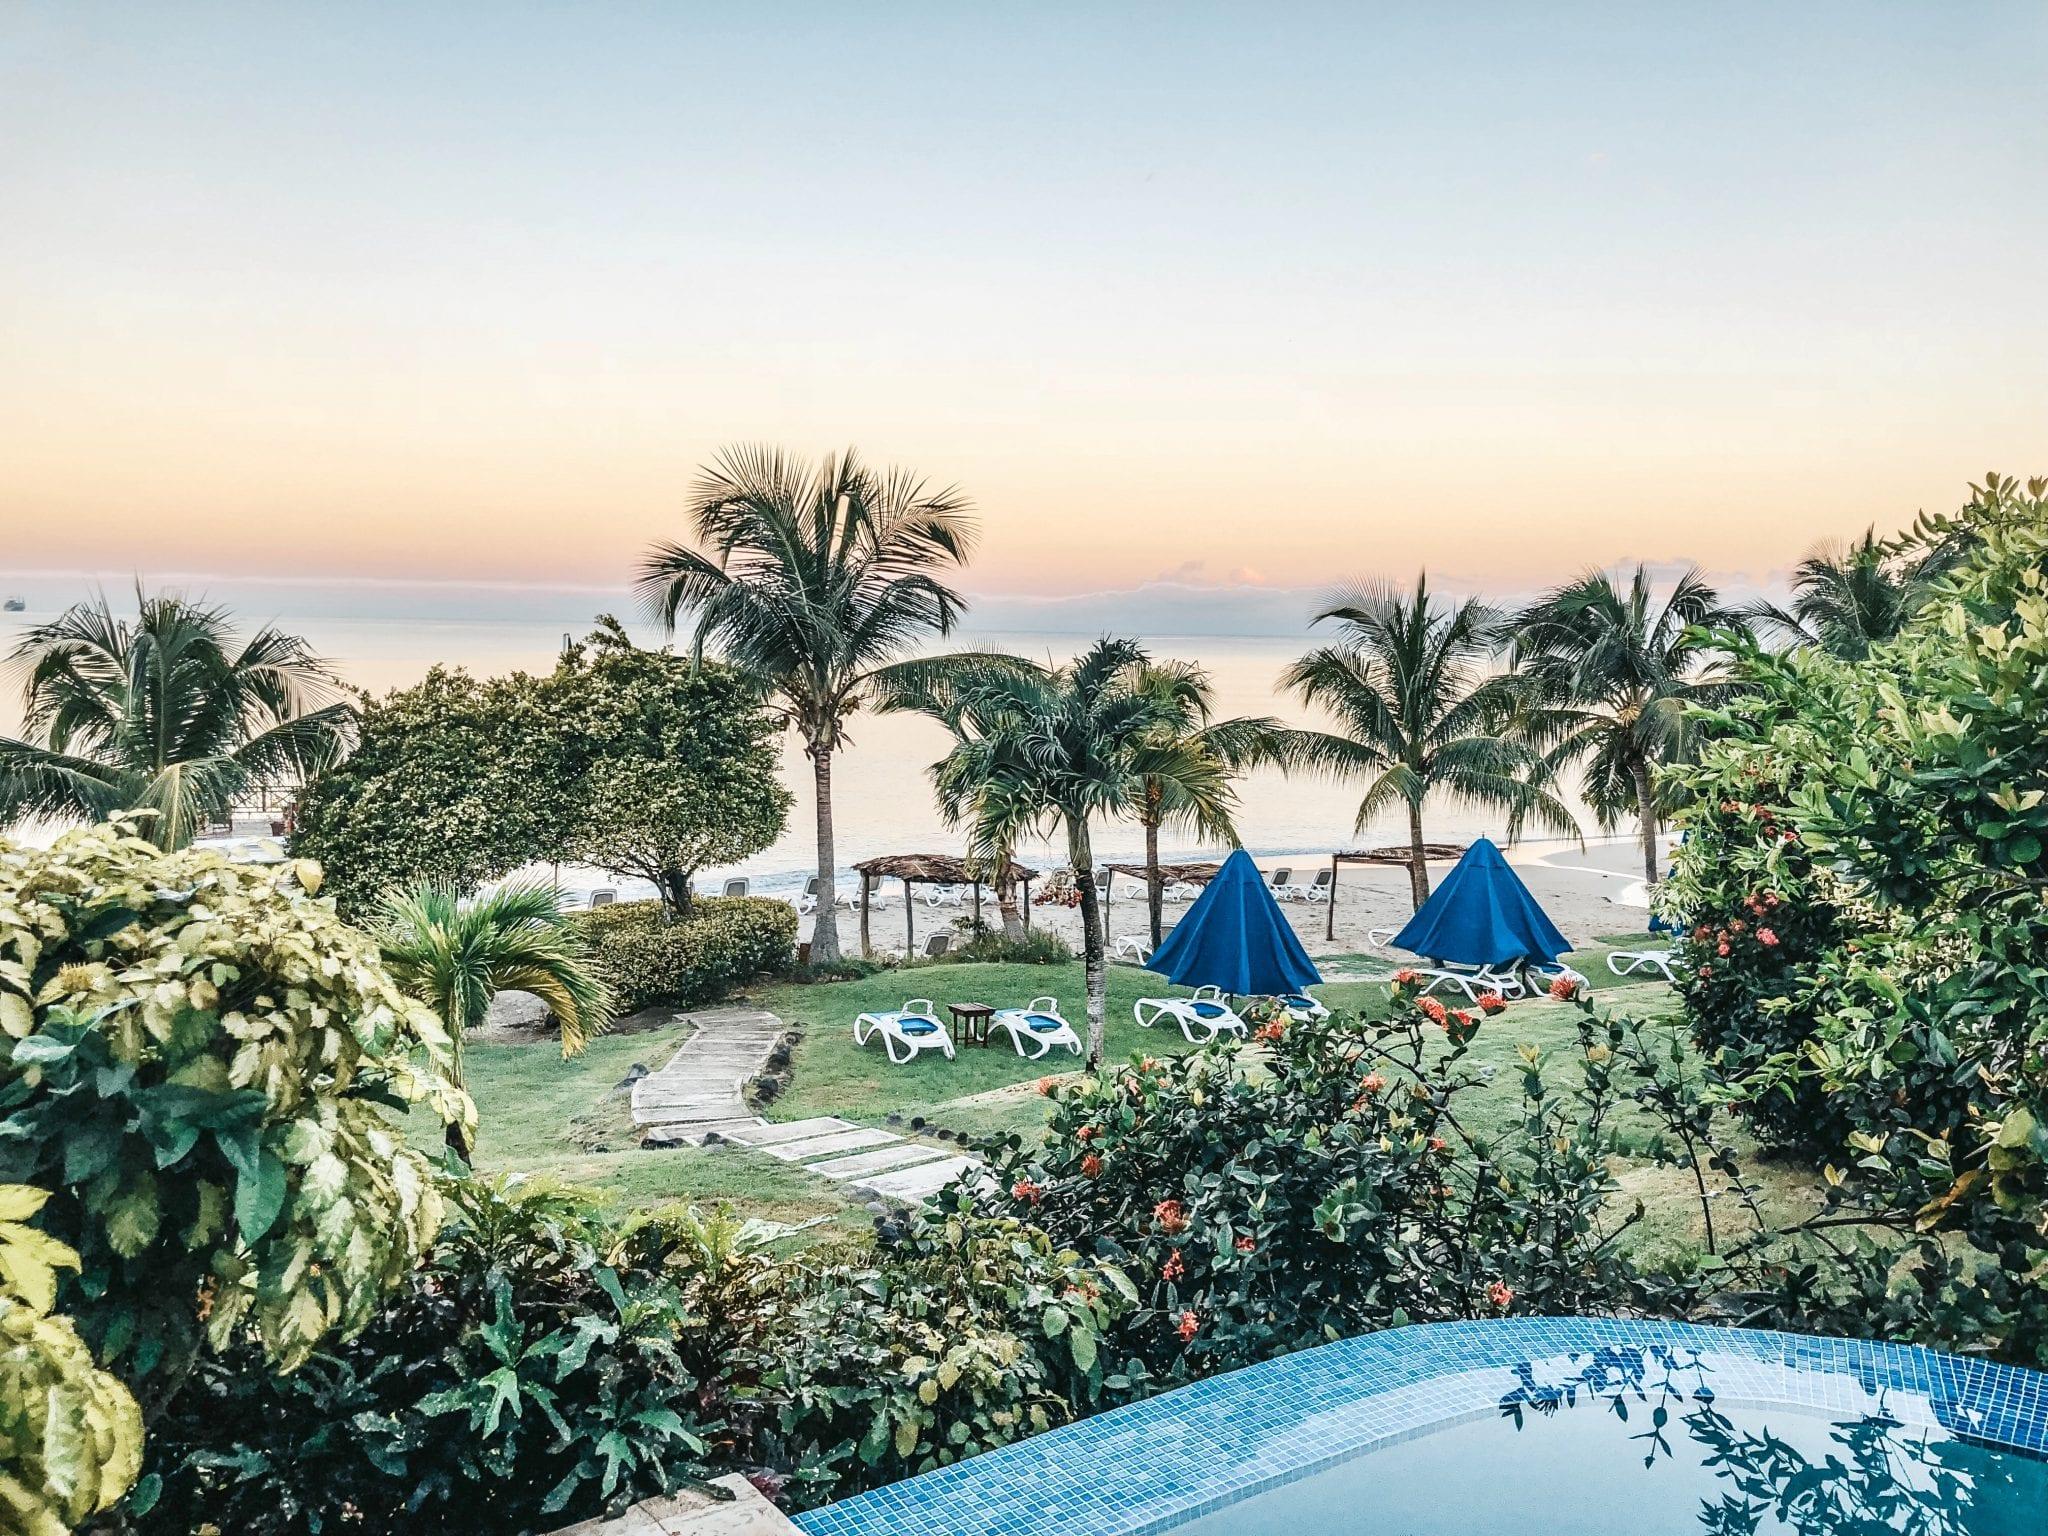 Calabash Cove - St. Lucia All-Inclusive Resort